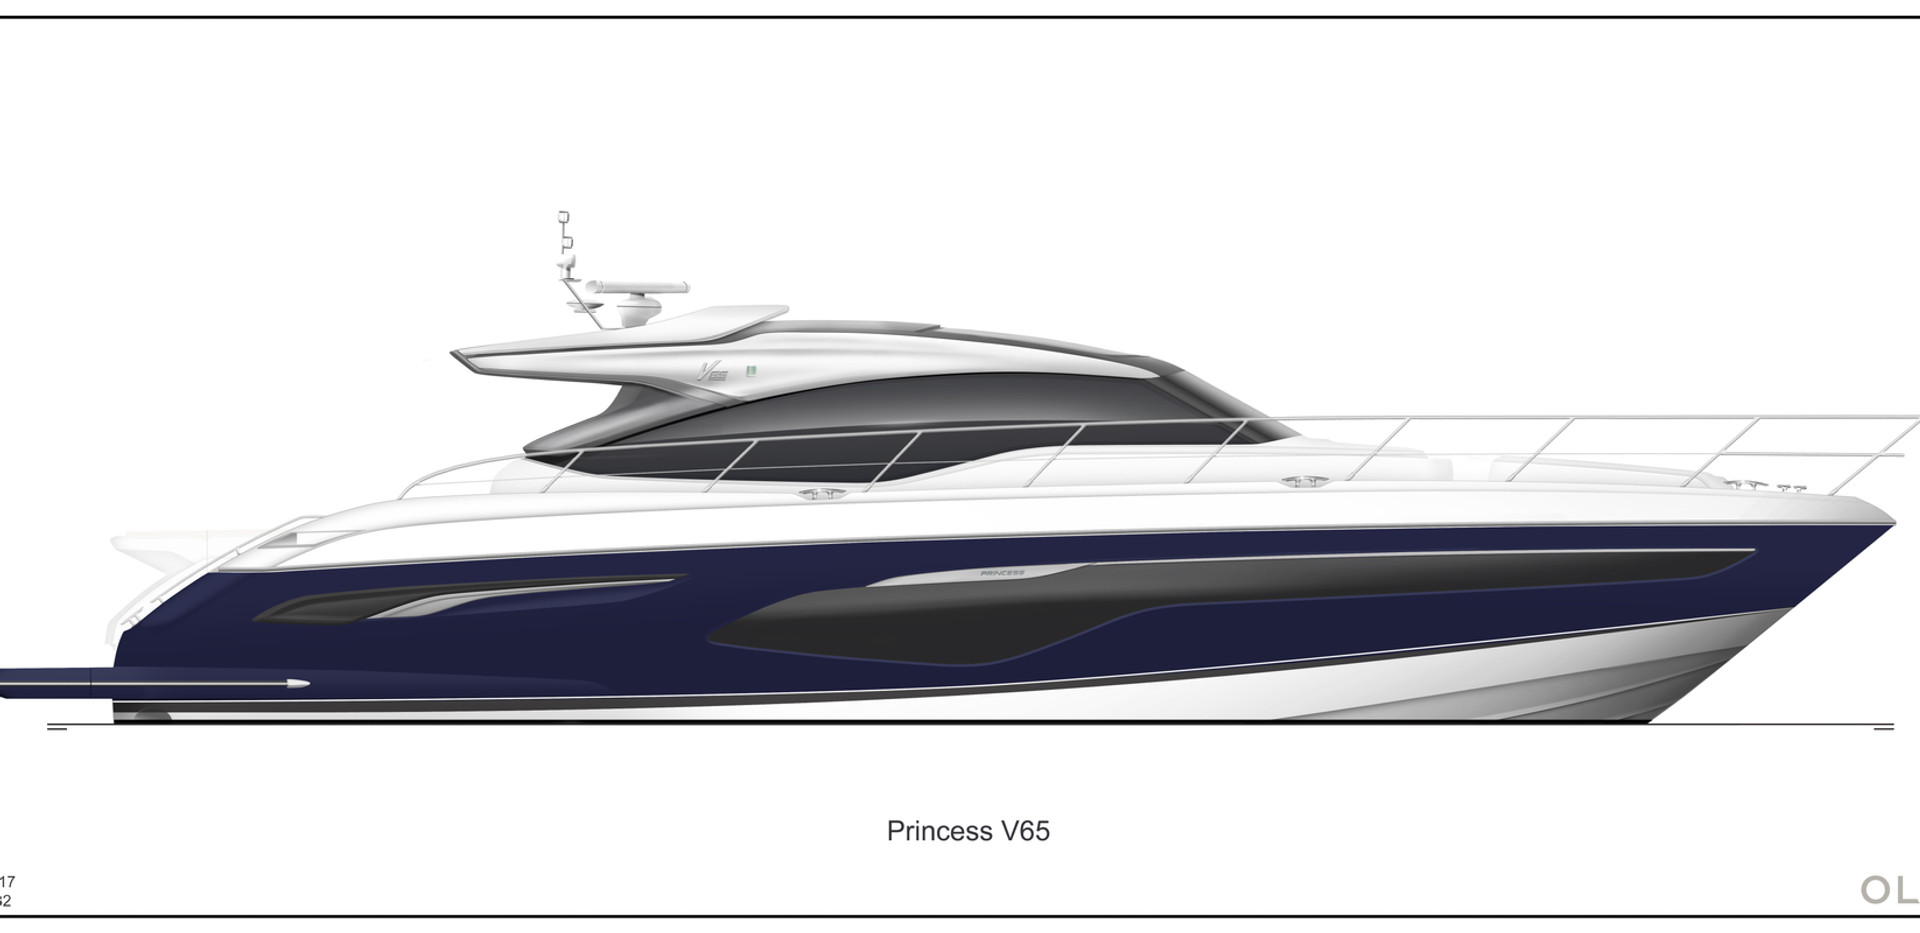 v65-profile-blue-hull.jpg